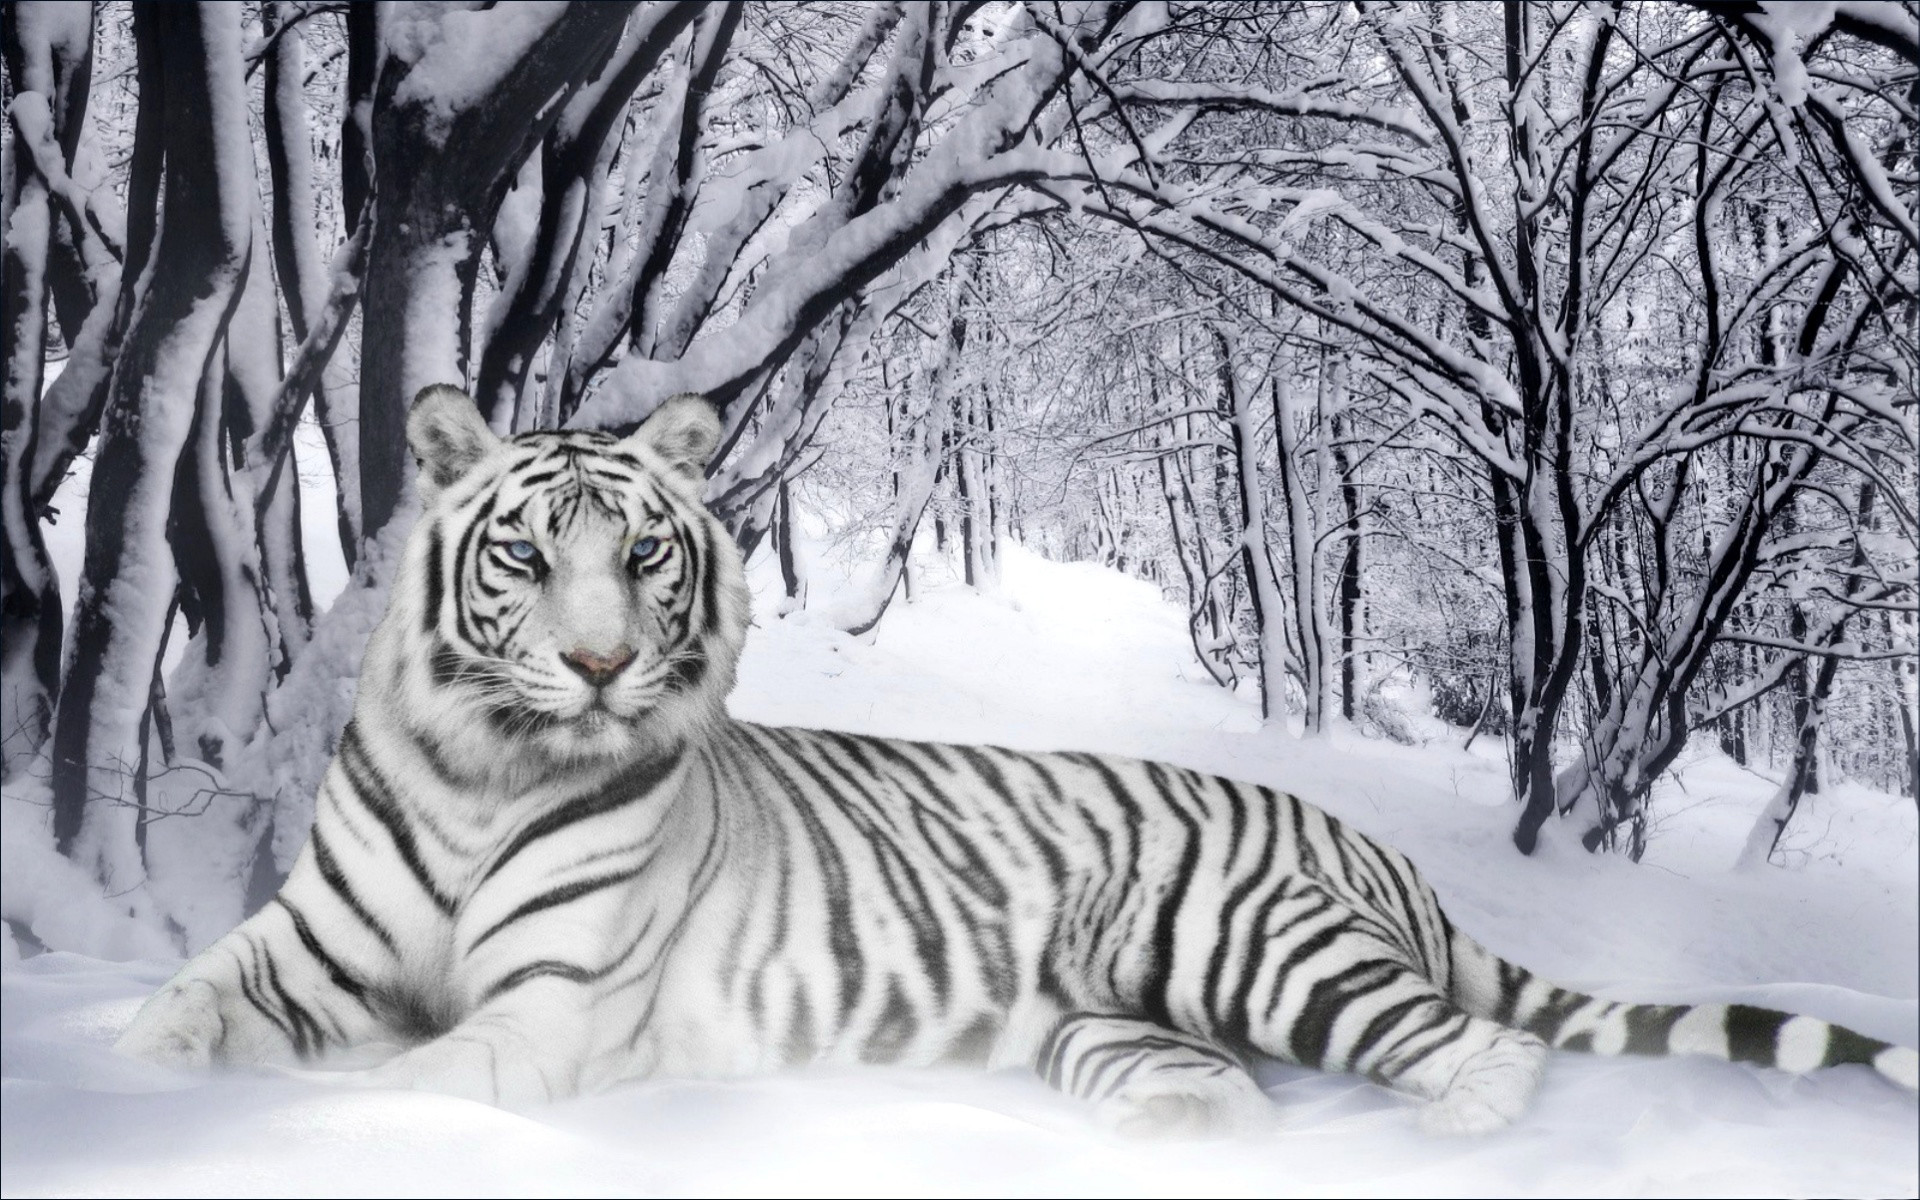 Winter animal desktop Backgrounds